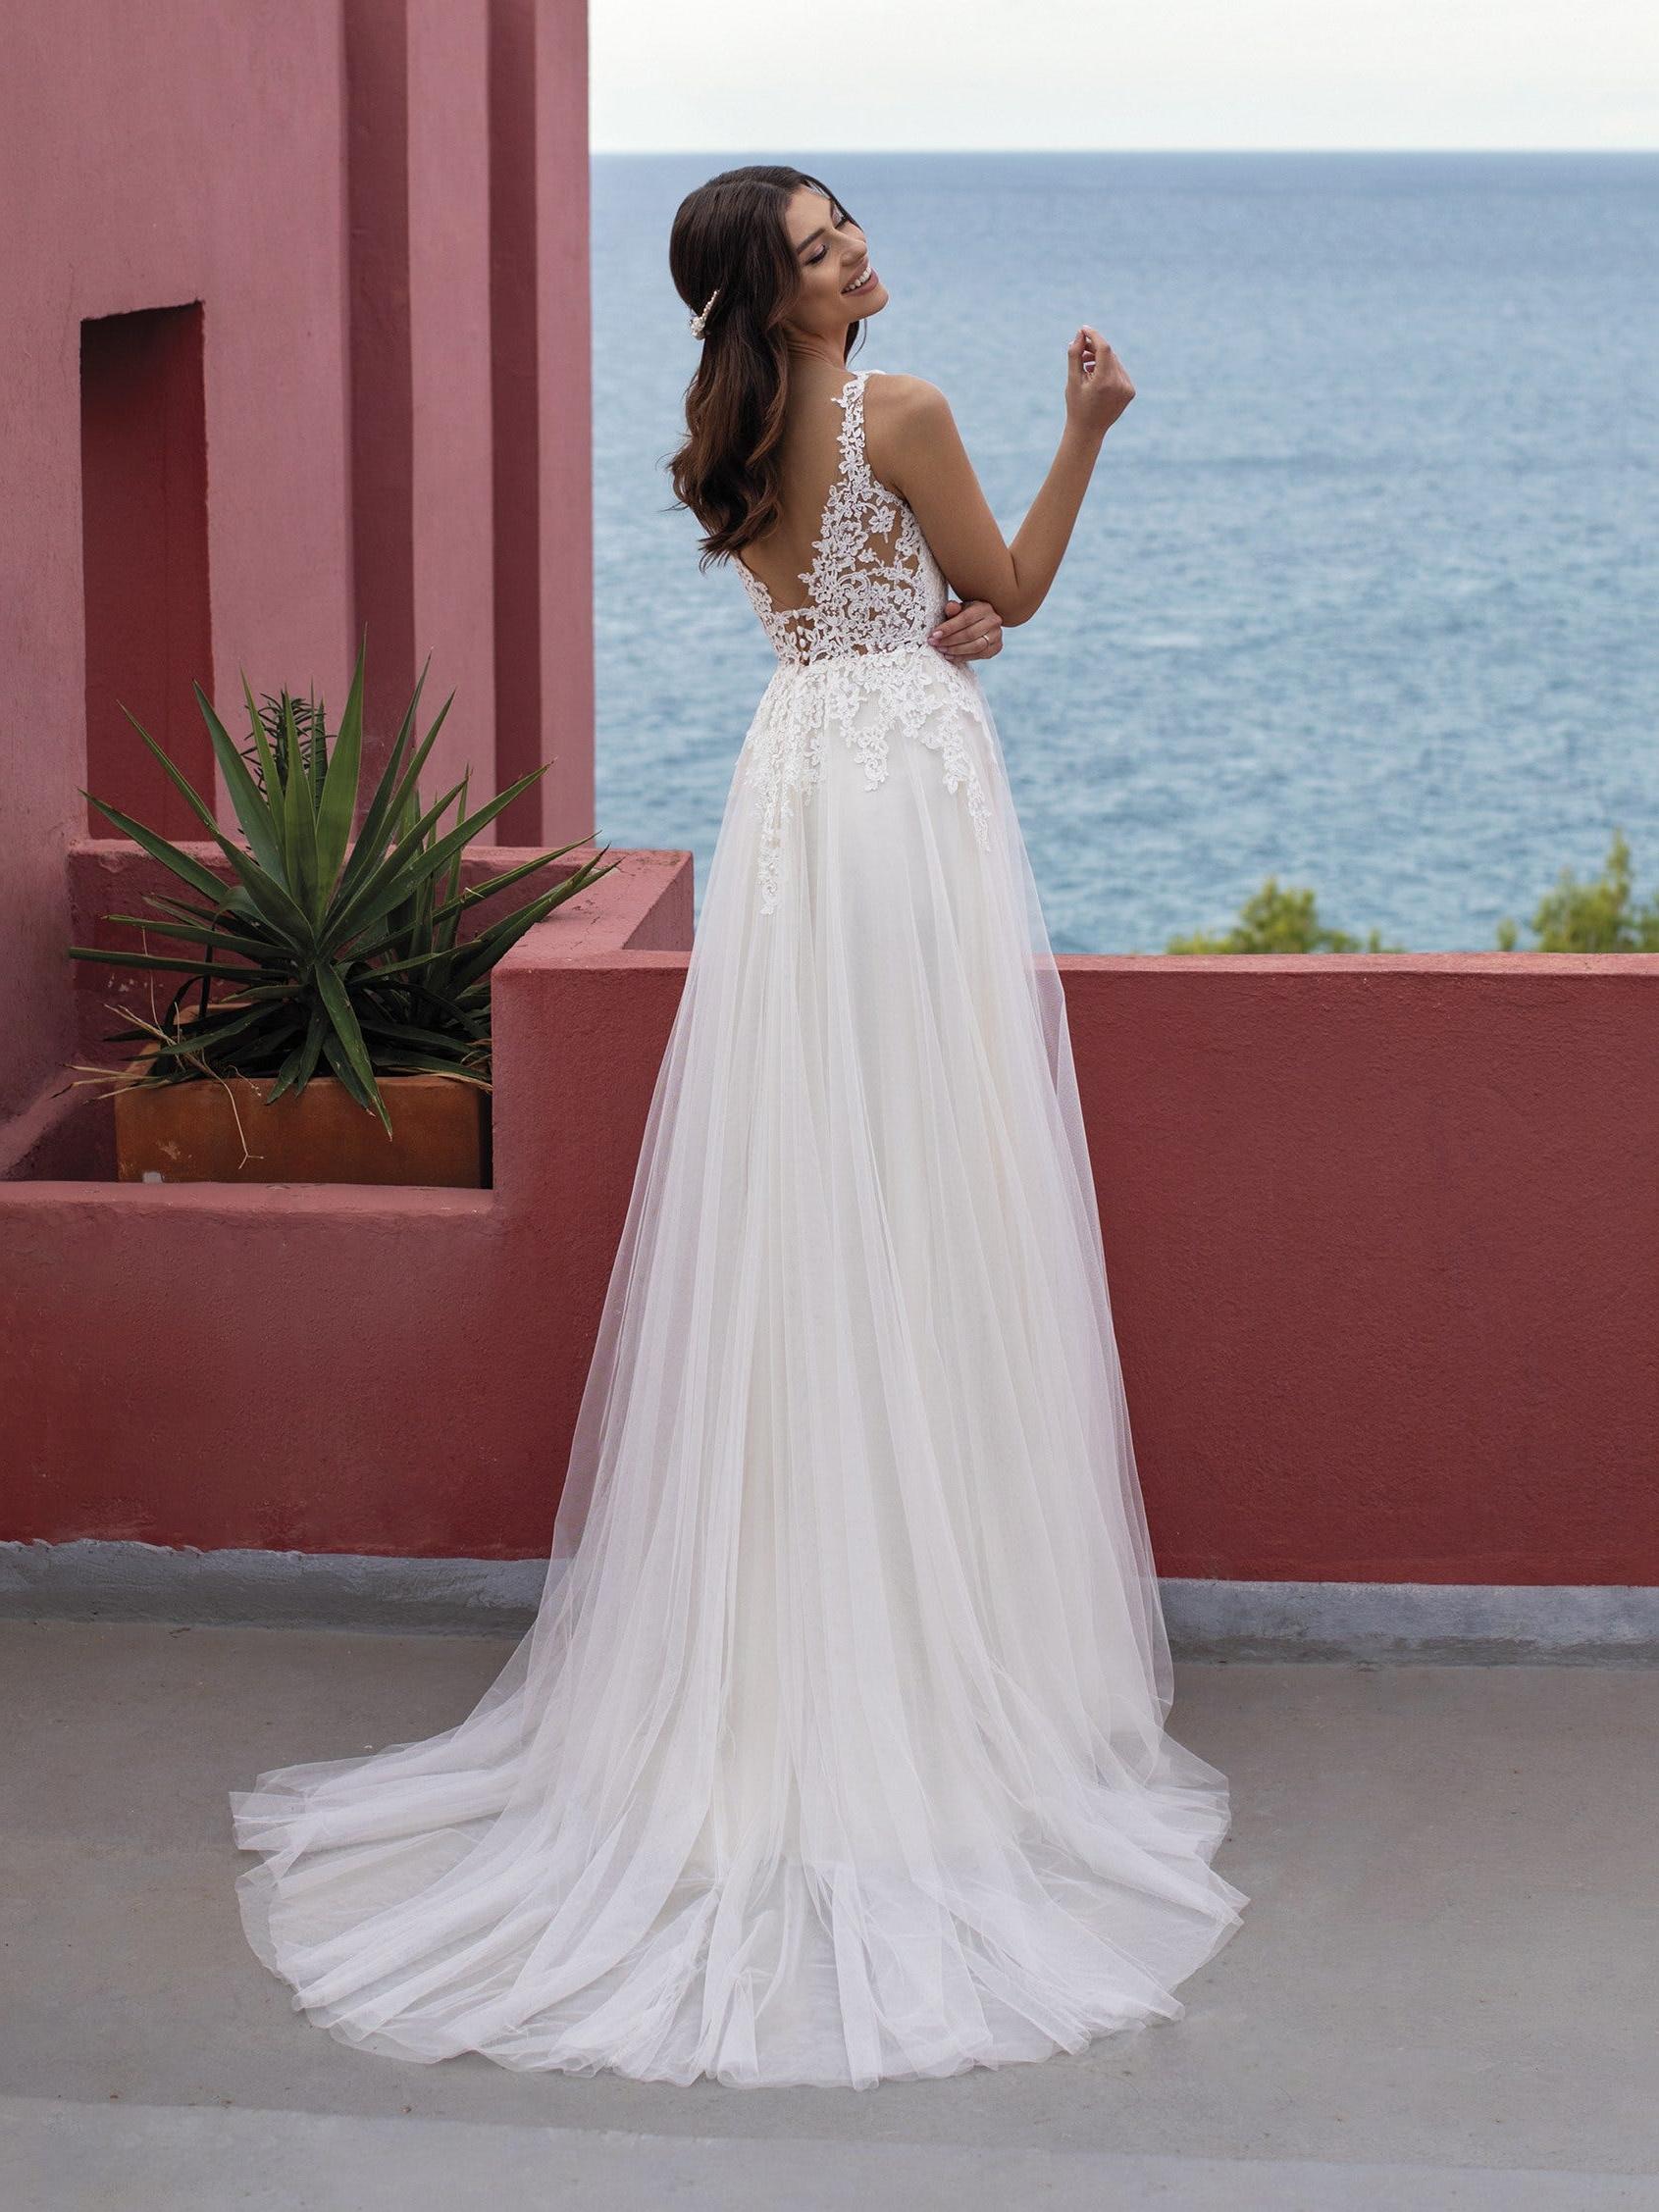 bruidsjurk met tule rok en kanten top white one